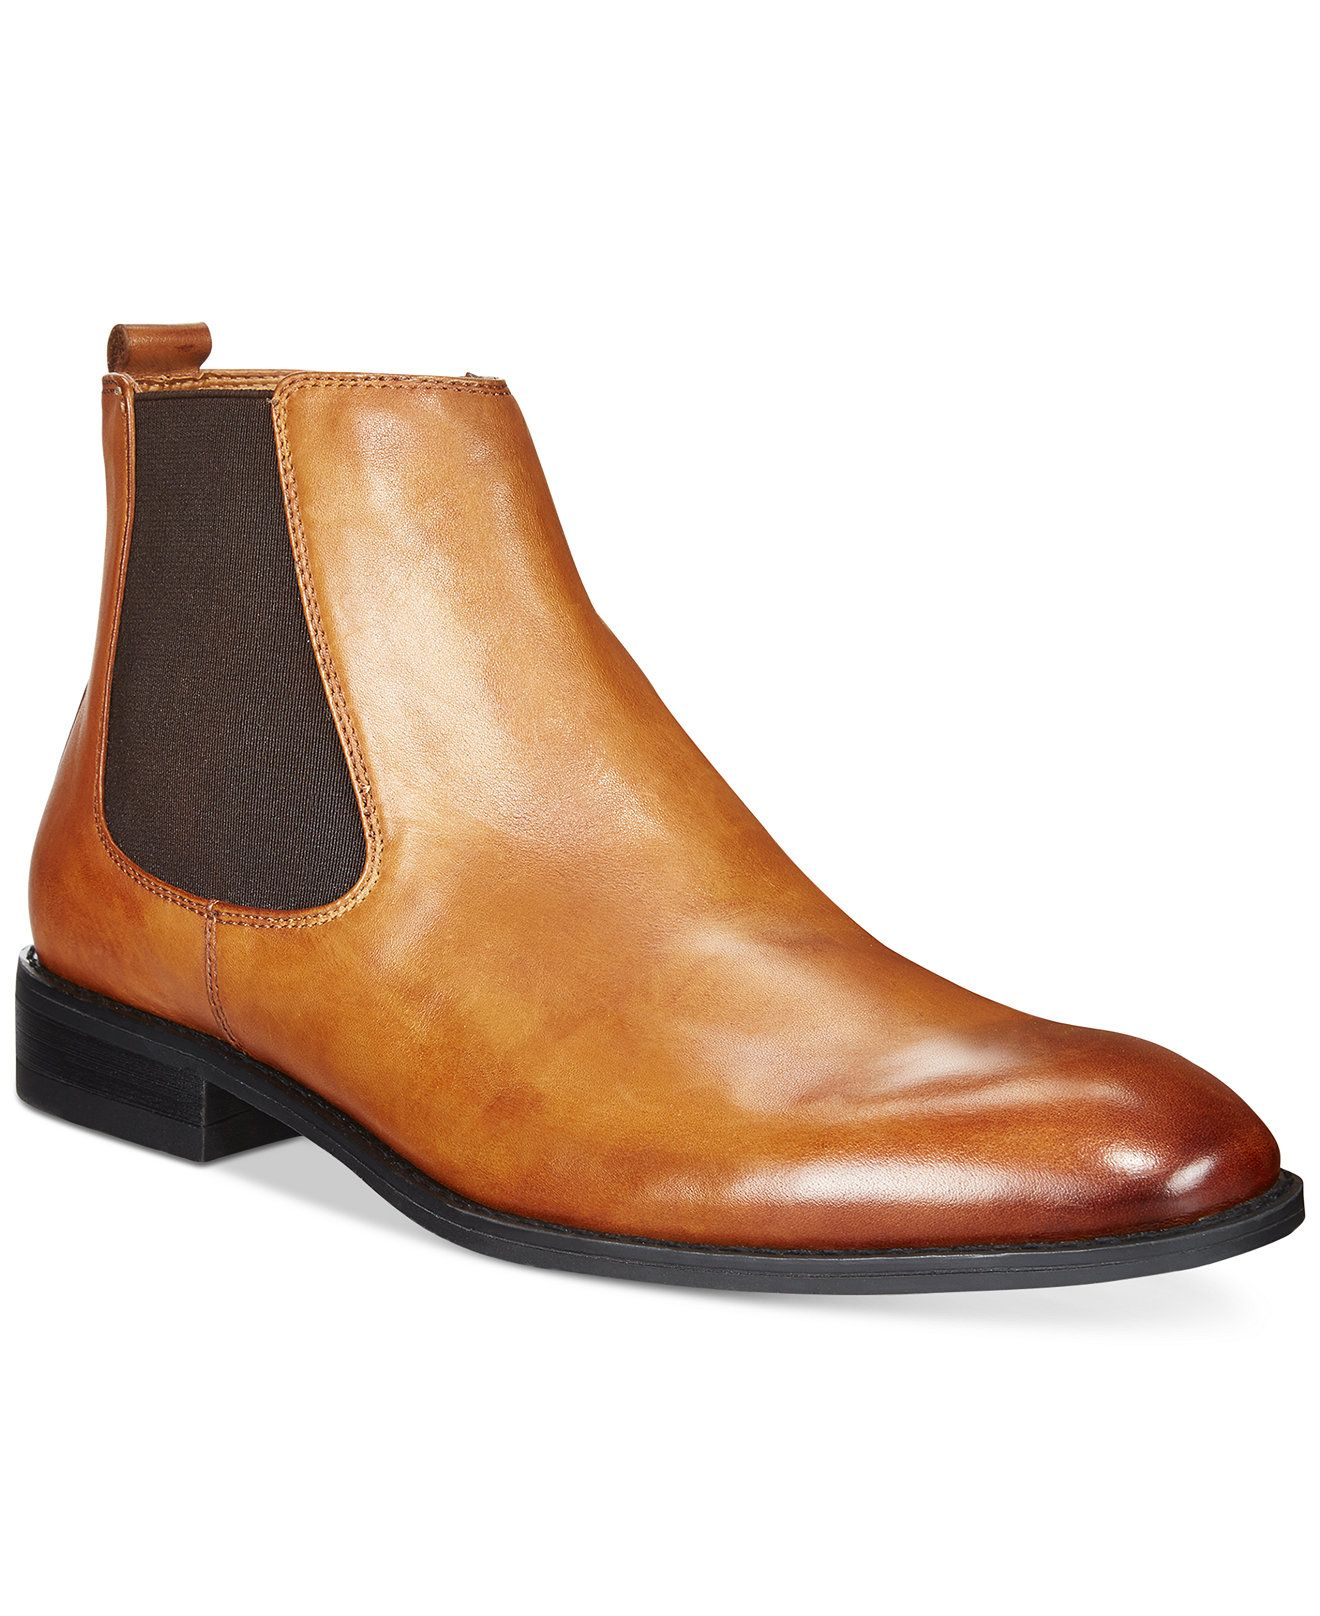 2016 Hot Sale Dune Manderin Leather Chelsea Boots Men Tan FXRXS68